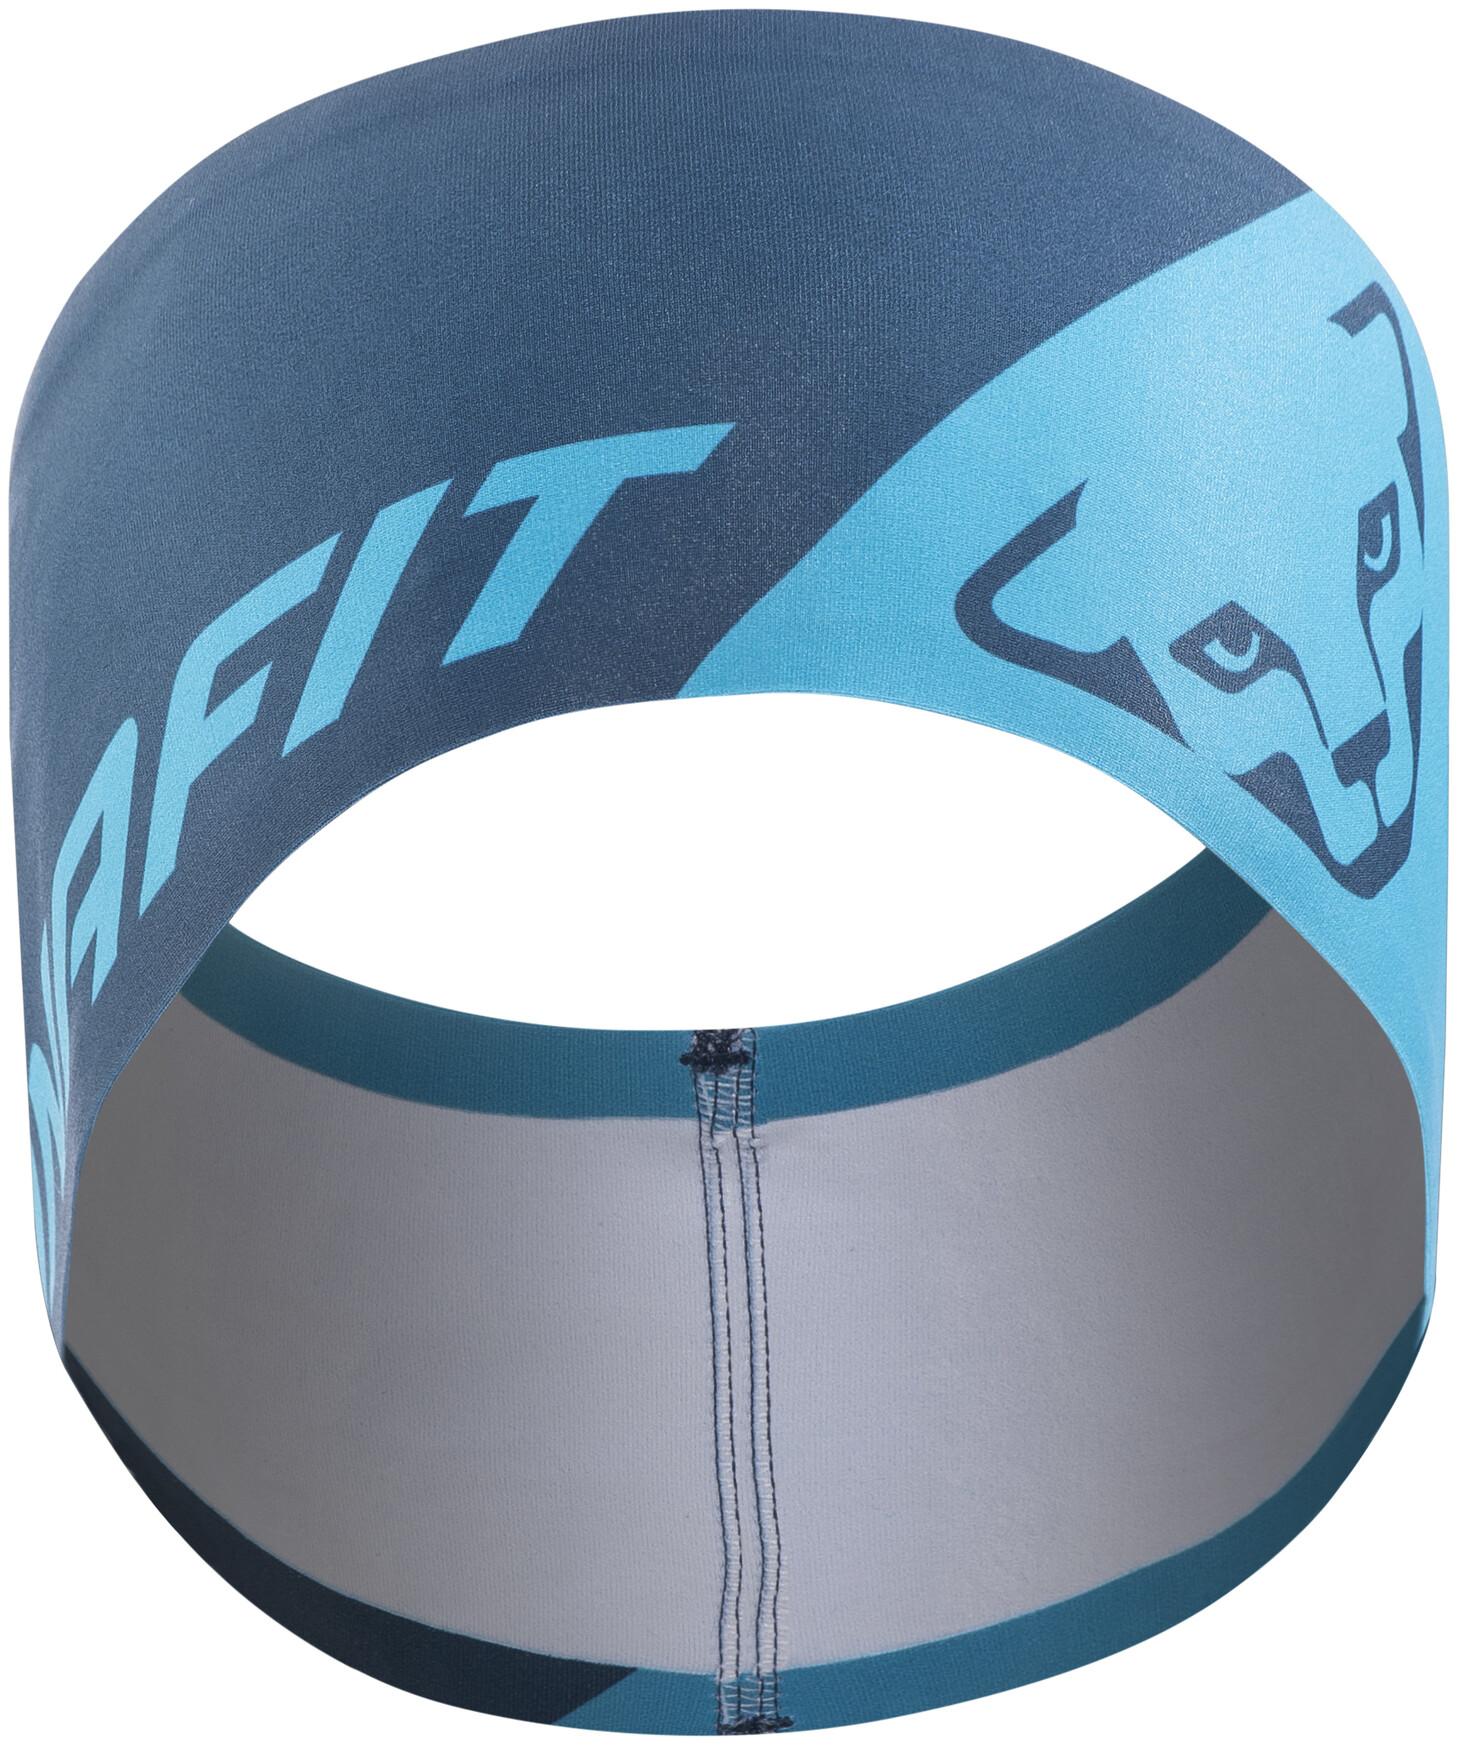 Dynafit Performance Dry 2.0 Hovedbeklædning, methyl blue (2020) | Hovedbeklædning